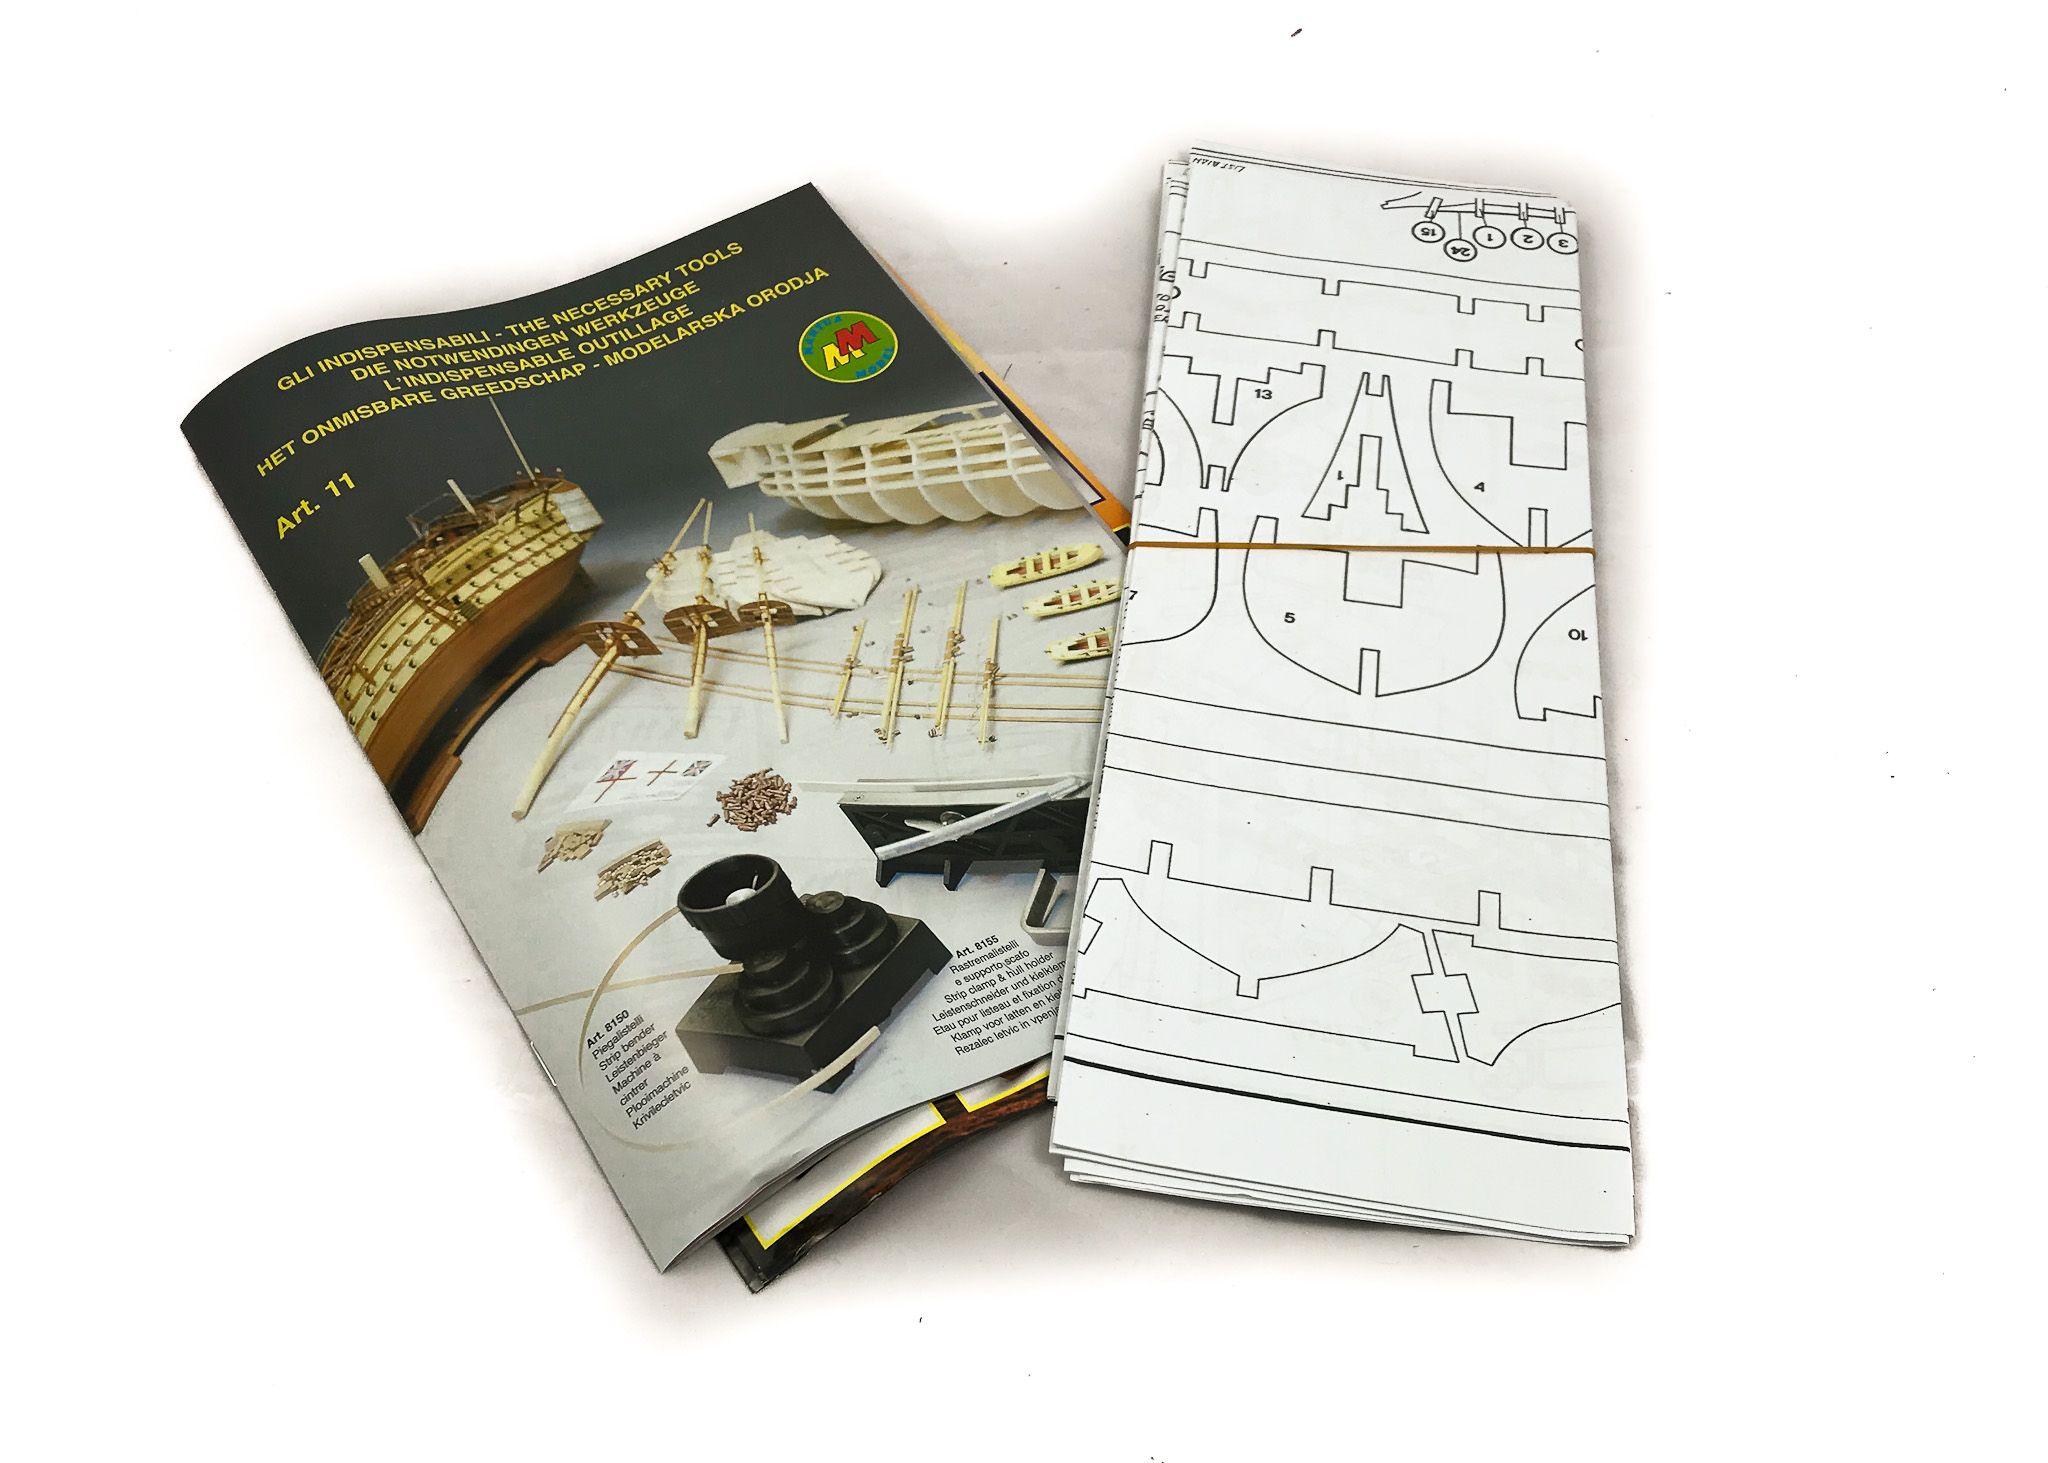 1594-13772-Thermopylae-Model-Ship-Kit-Sergal-791